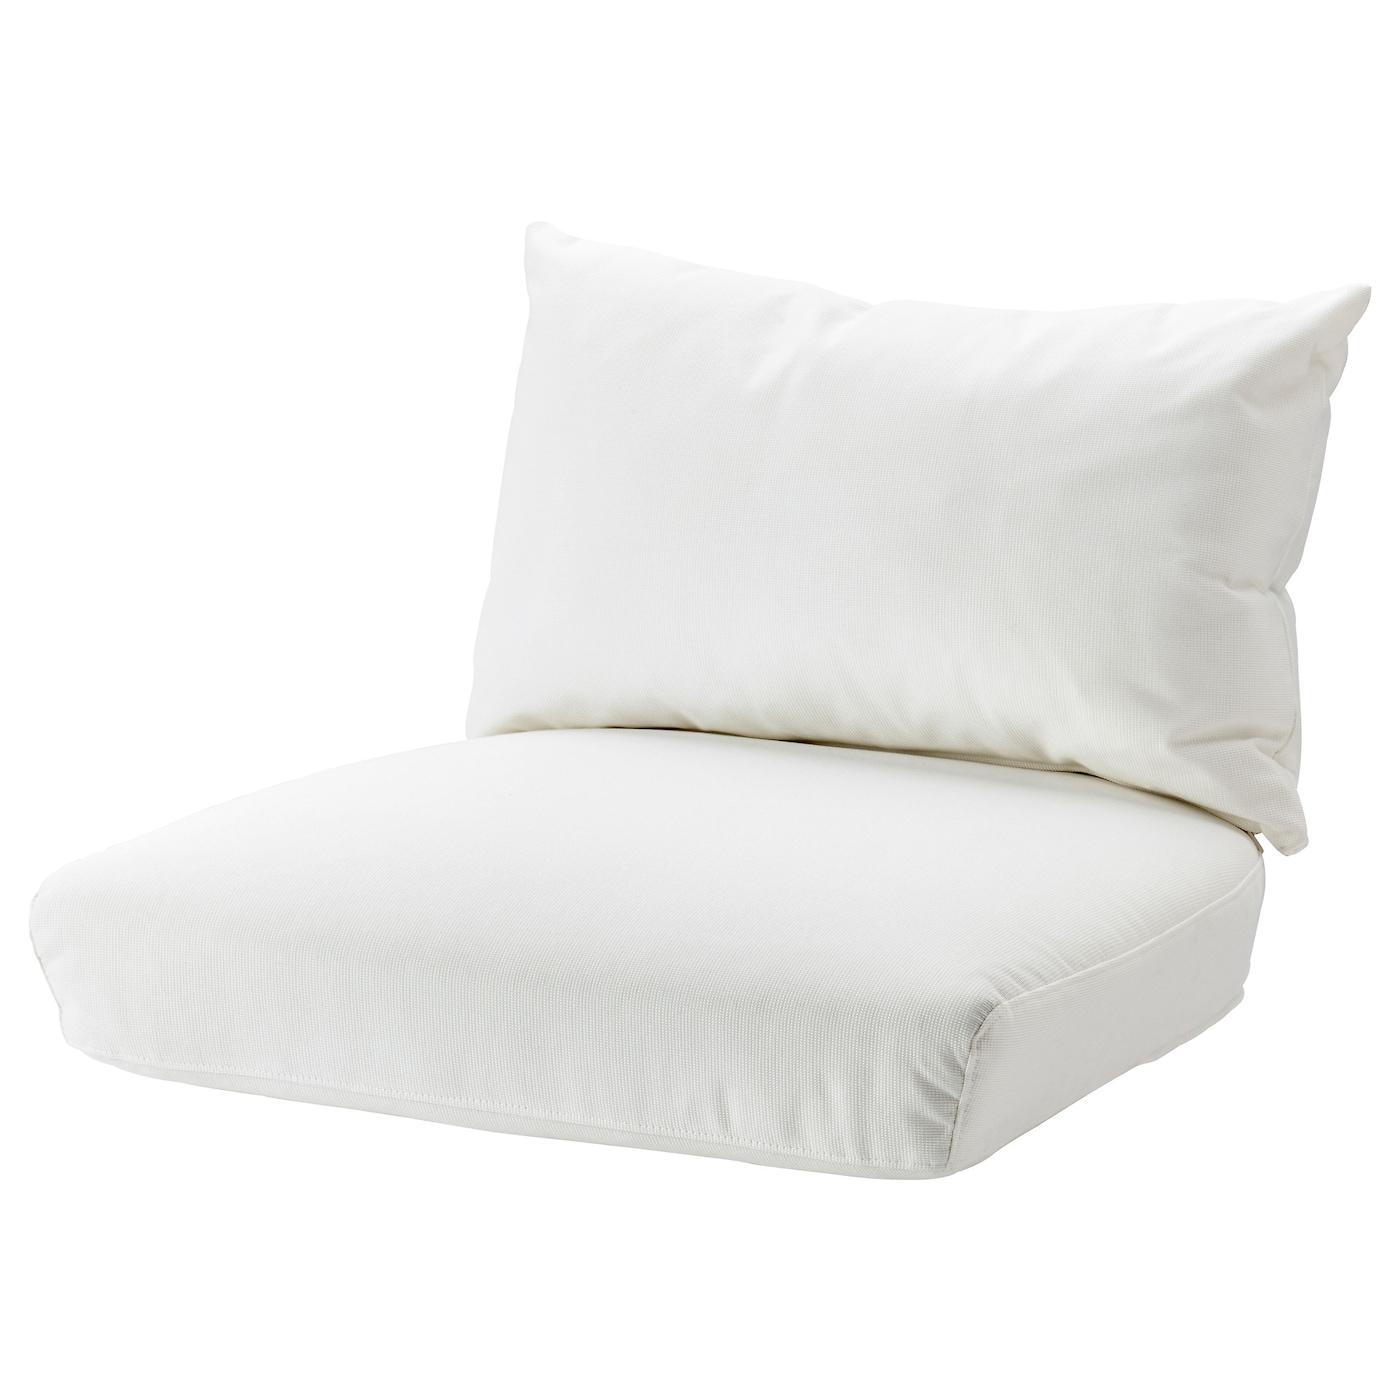 stockholm 2017 fauteuil rotan ikea. Black Bedroom Furniture Sets. Home Design Ideas